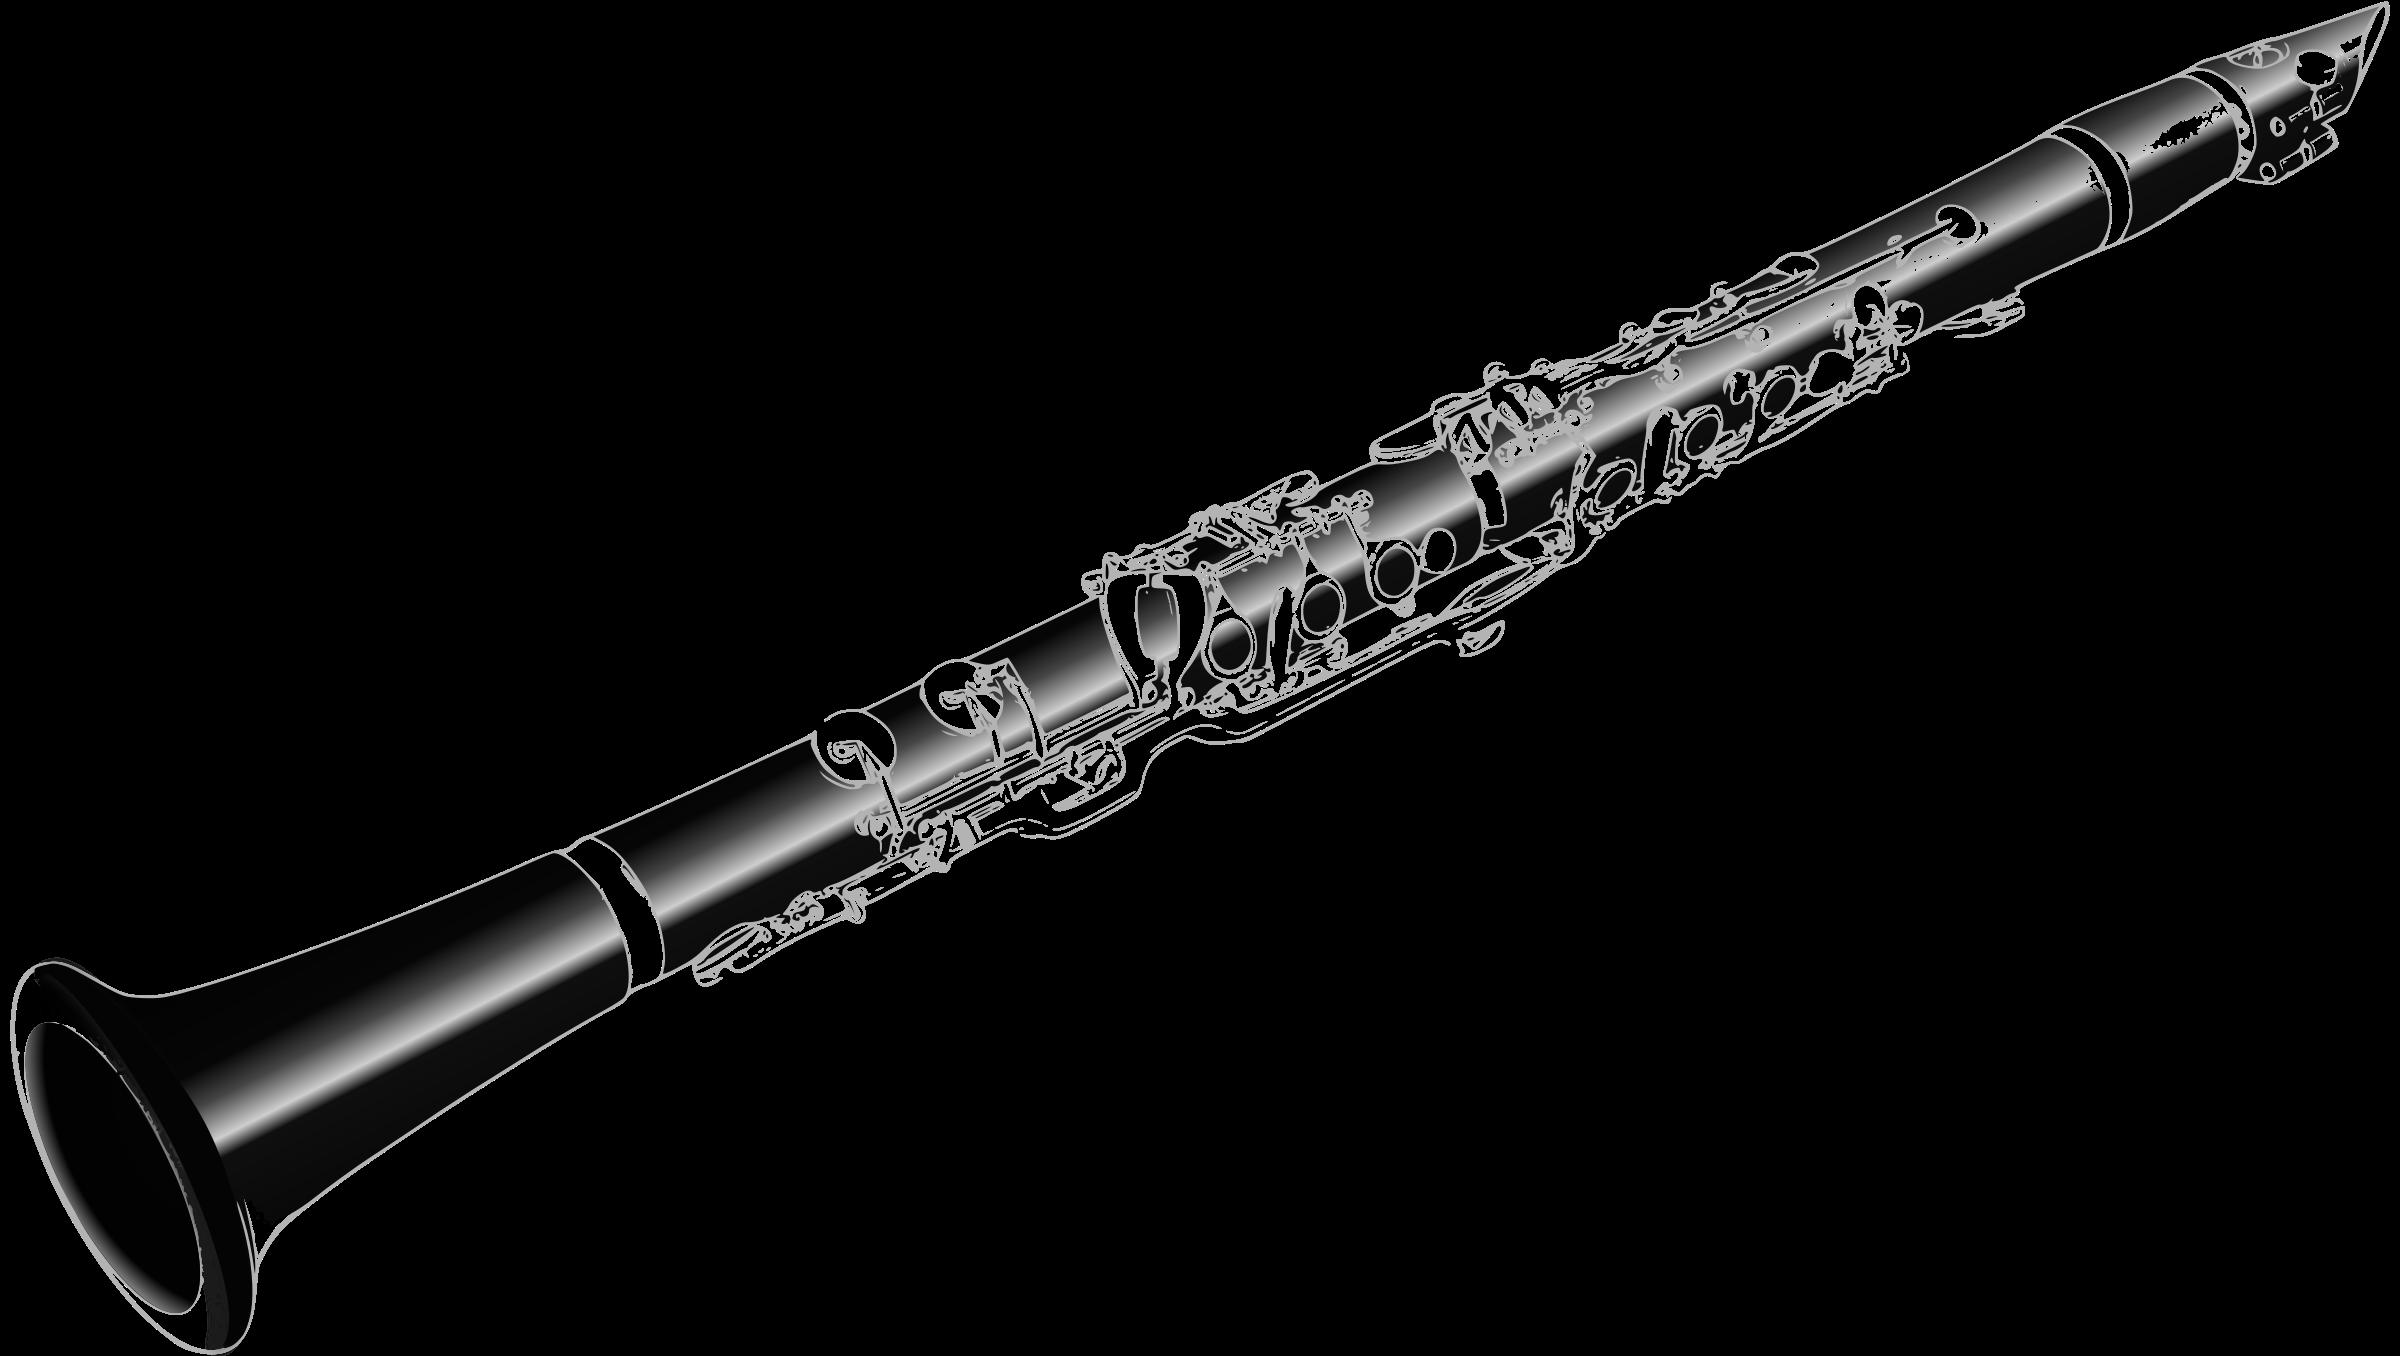 Clipart Clarinet